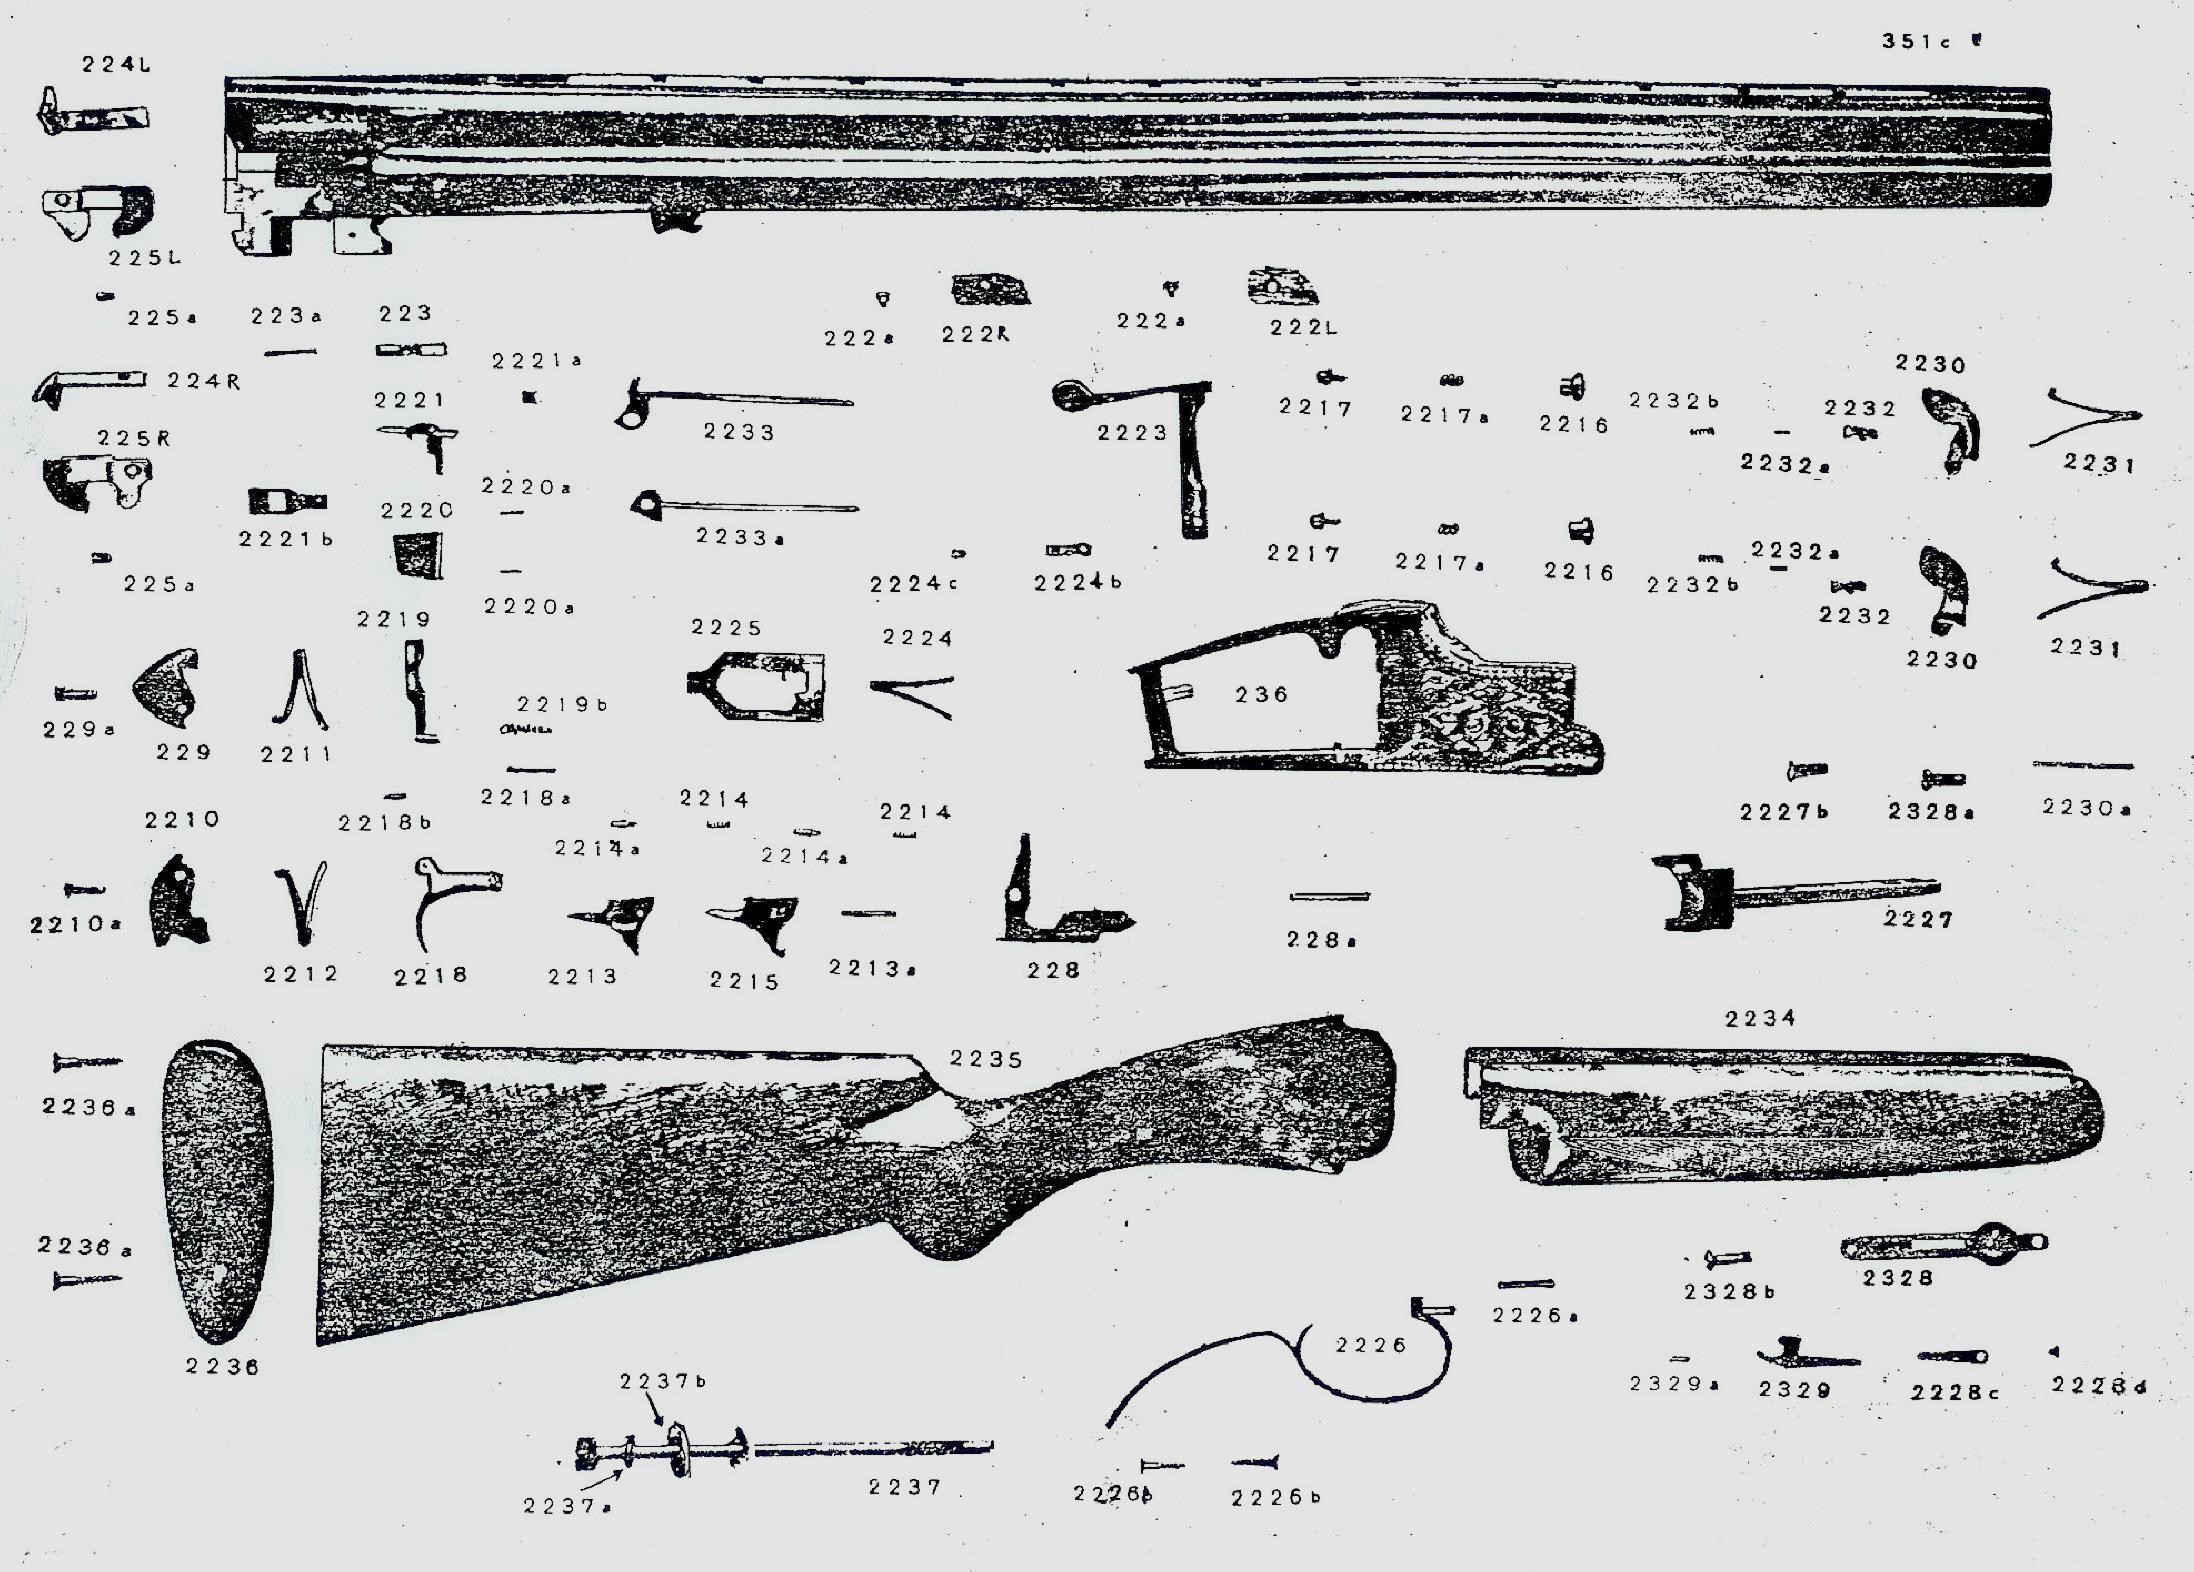 charles daly rh leeroysramblings com escort shotgun parts diagram firearms parts diagrams